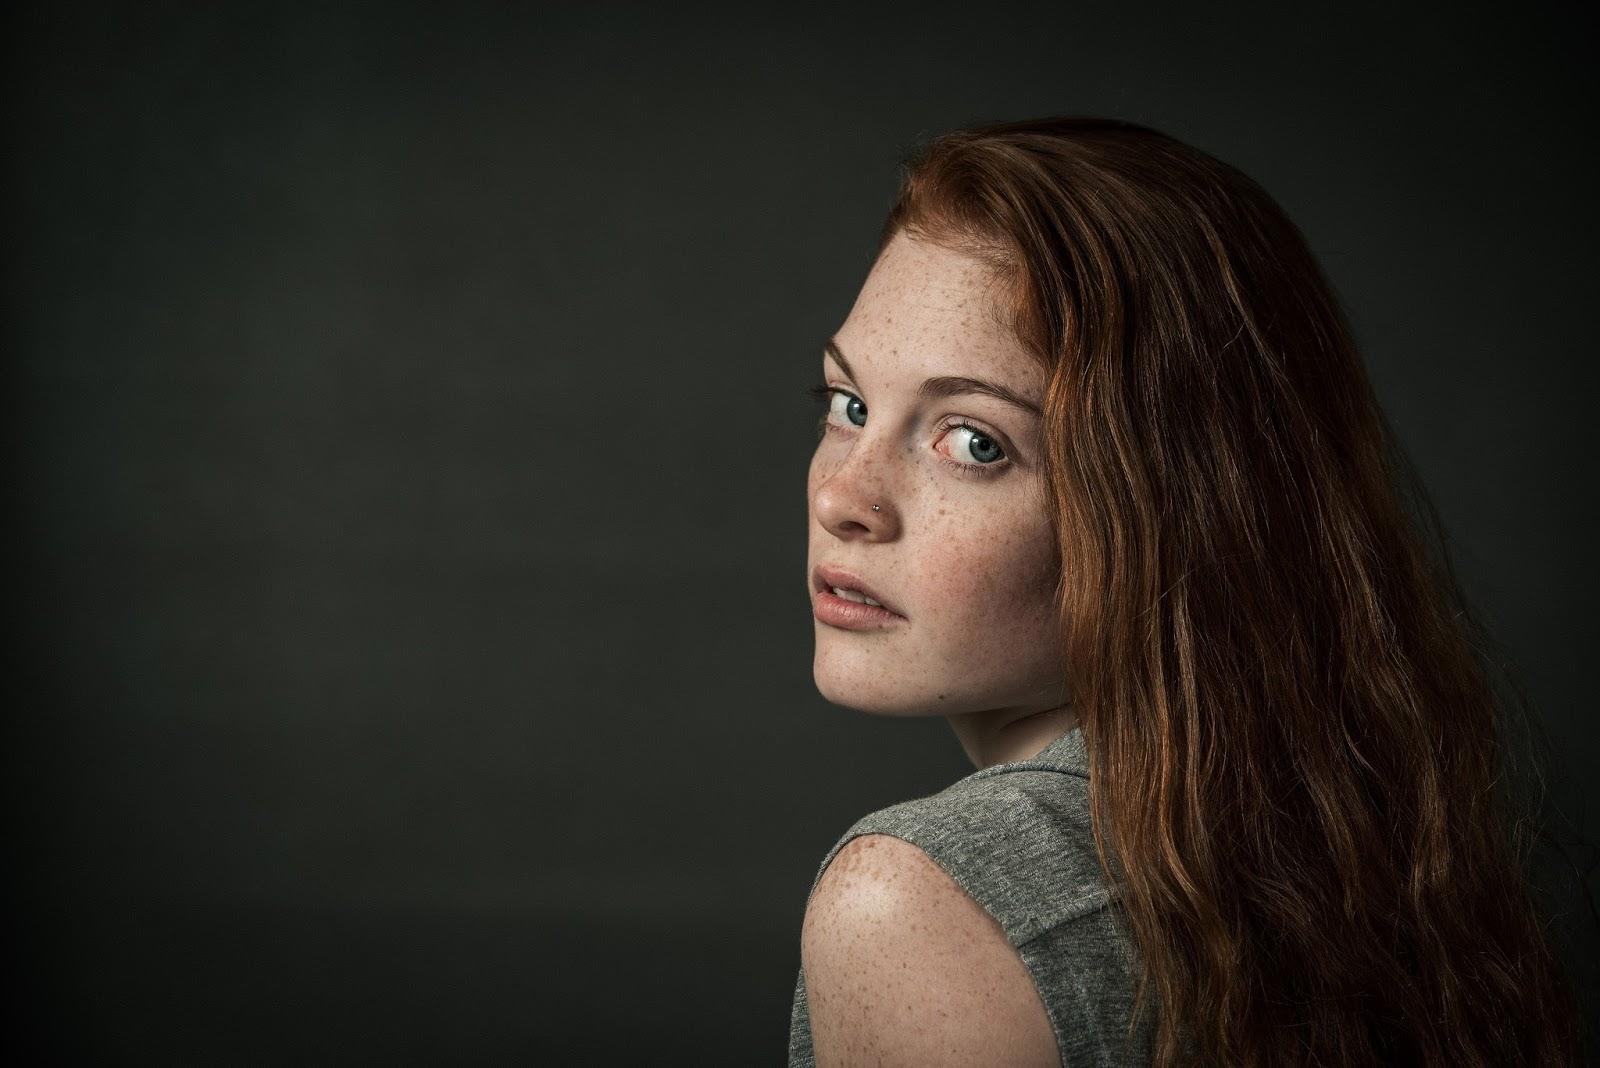 stacy lynn senior photography studio red head